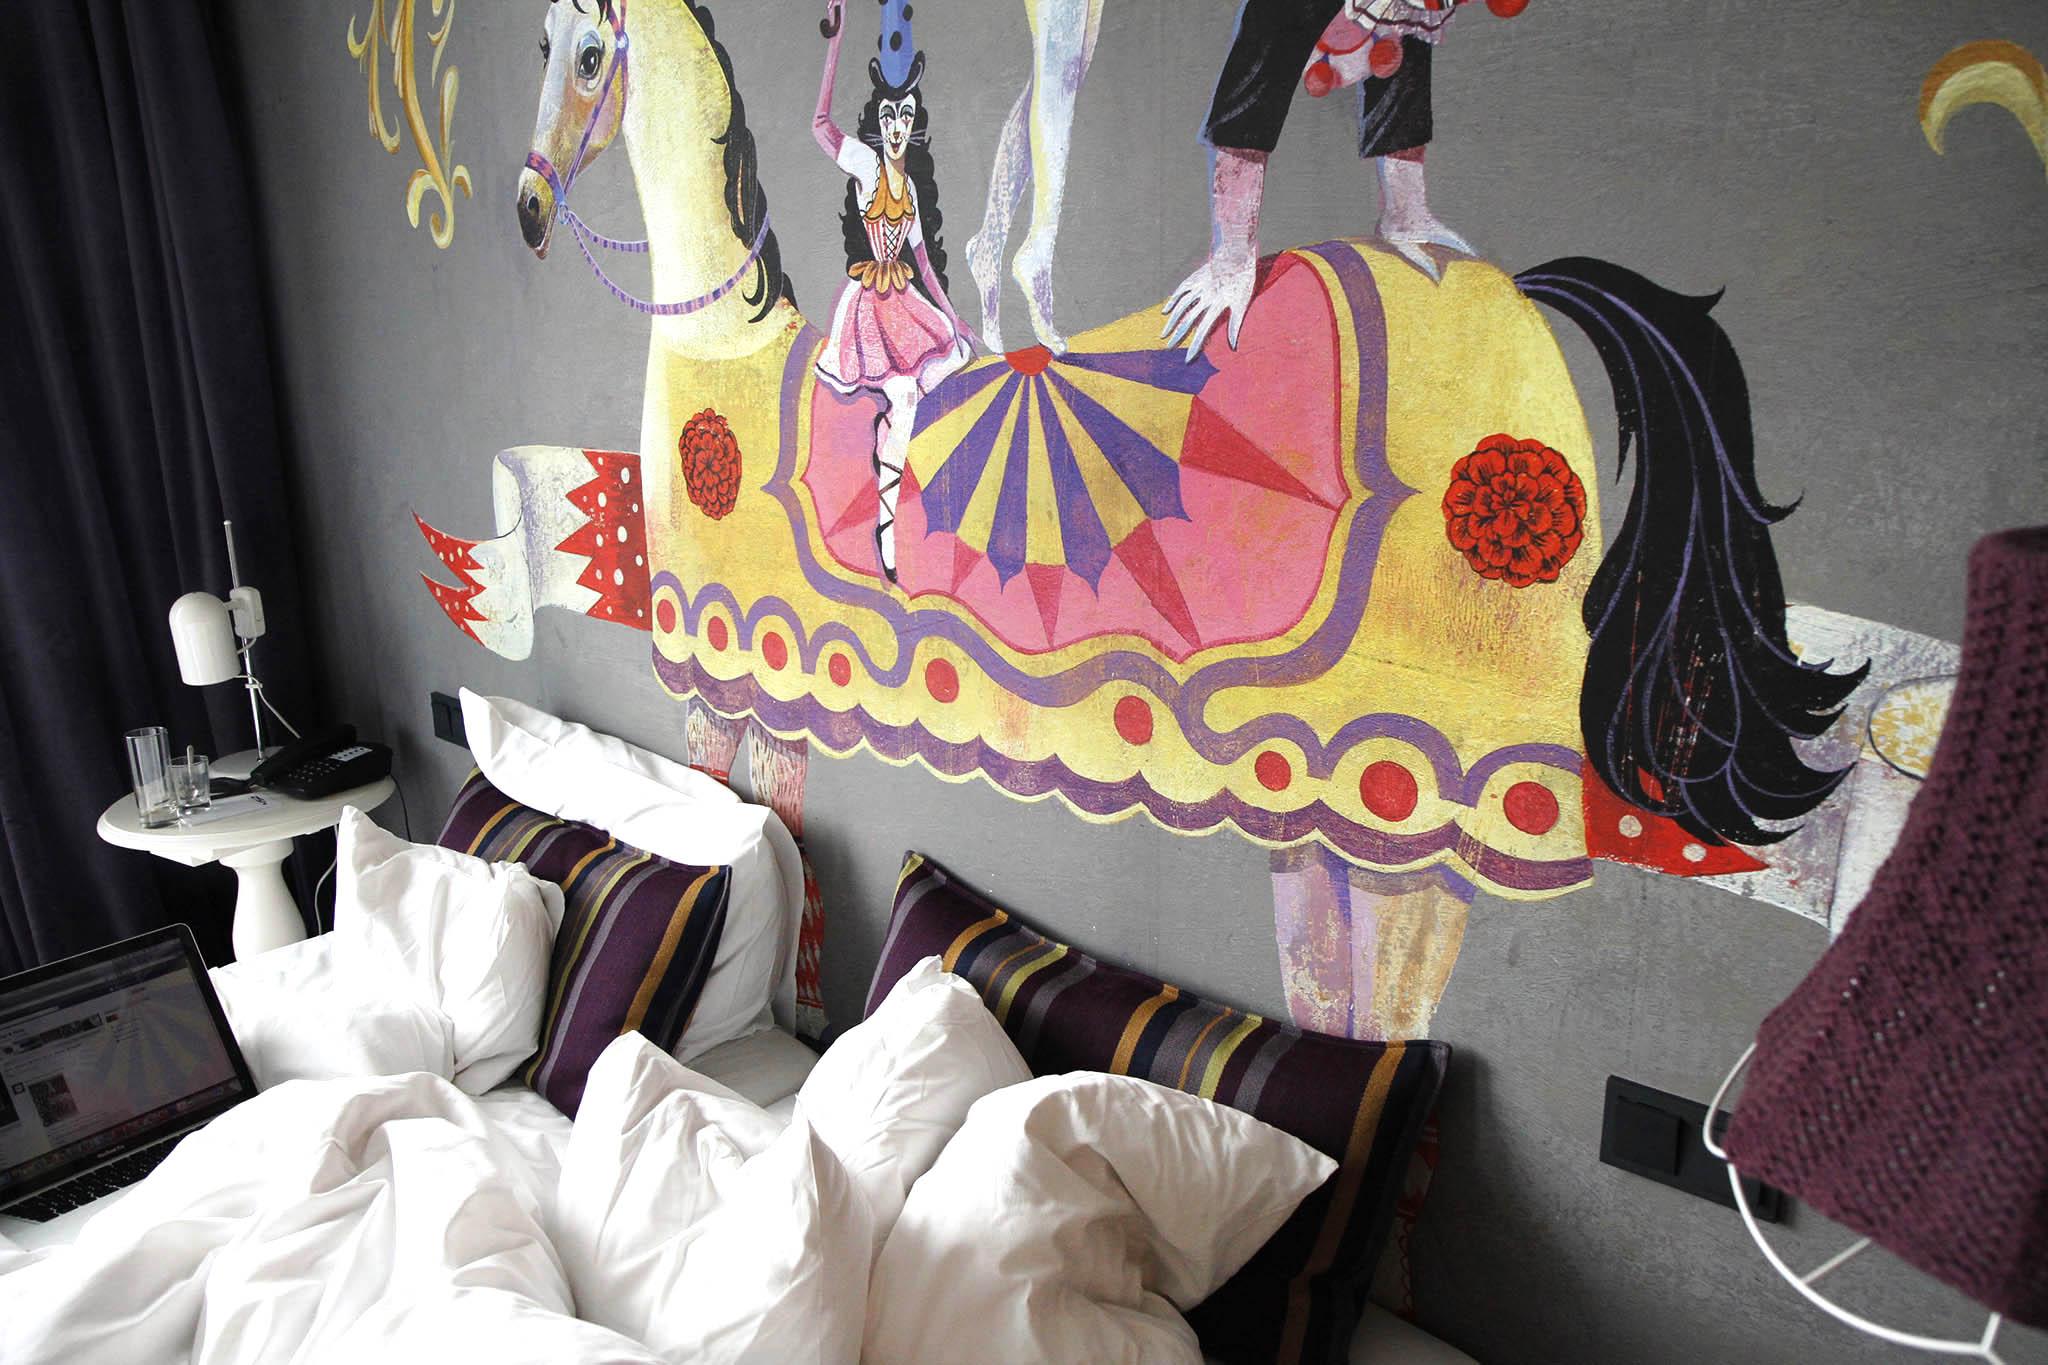 2017-04-25hrs-Hotel-Wien - 25-hours-hotel-vienna-nectarandpulse-interior-3.jpg